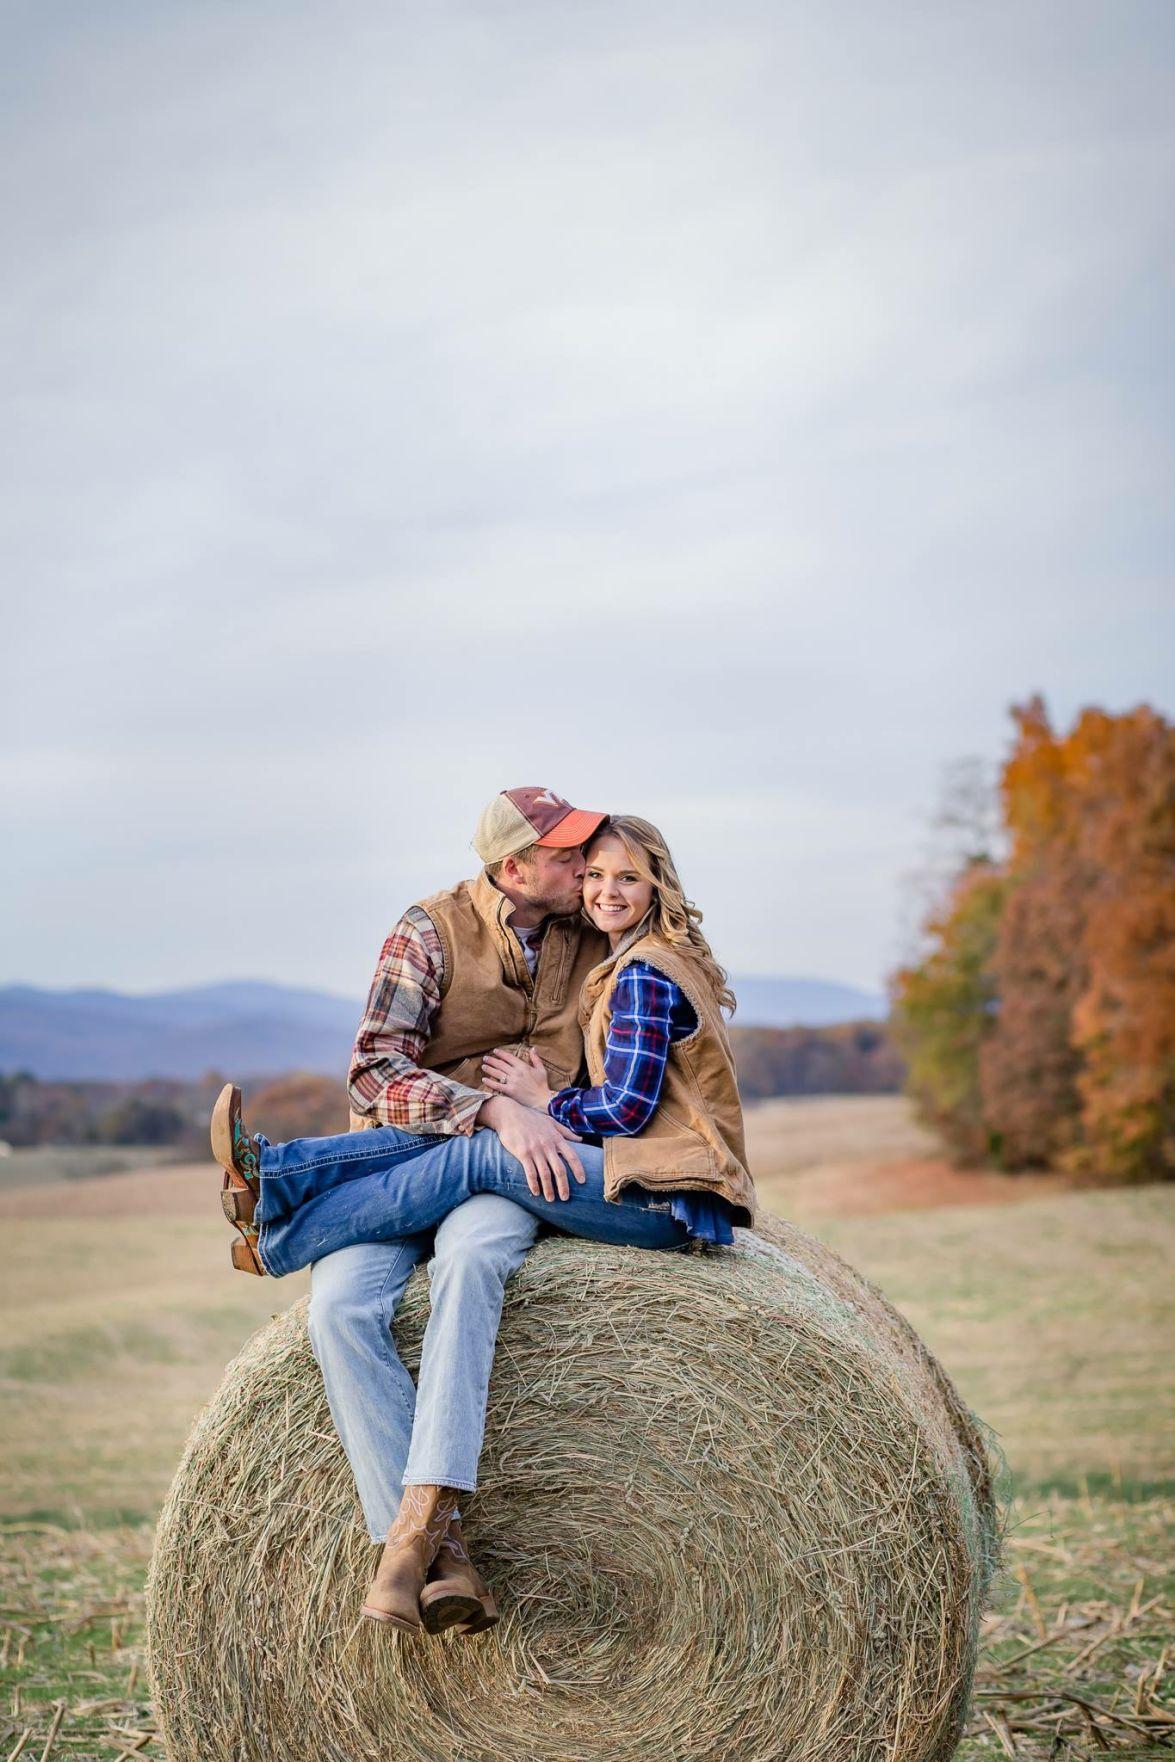 David and Katelynn Falk